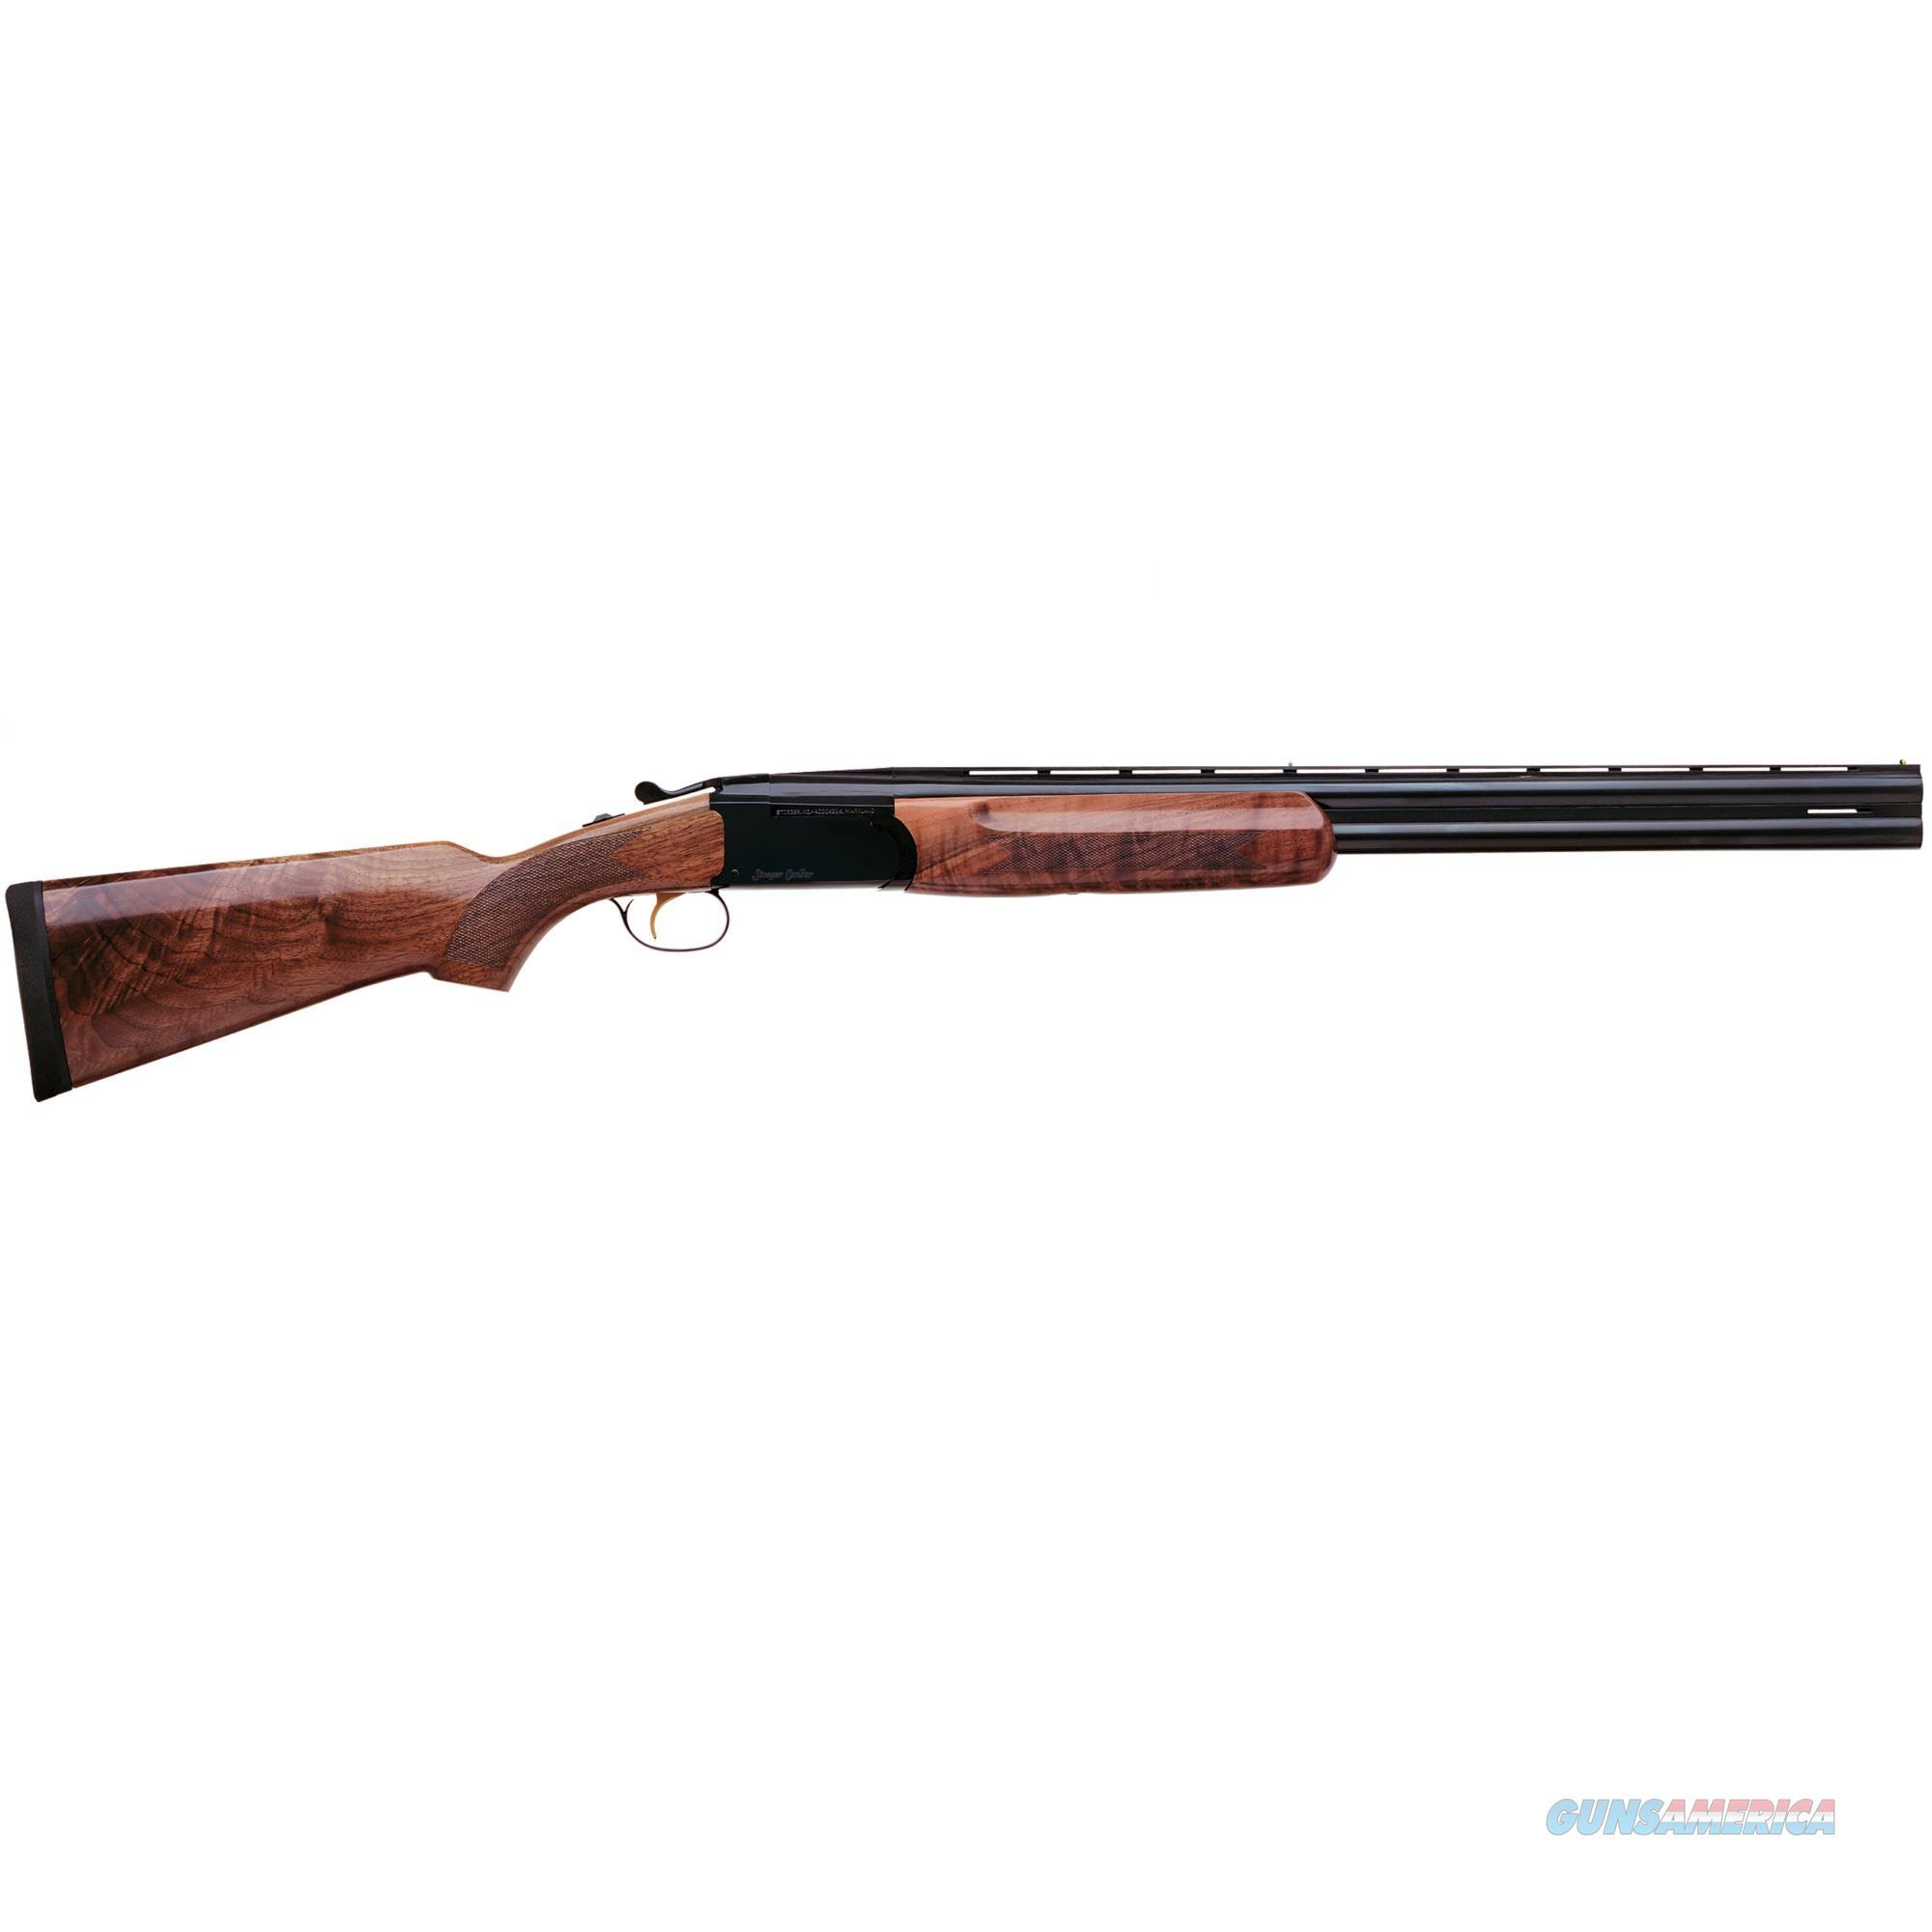 "Stoeger Condor Supreme 26"" O/U AA-Grade Walnut 12 Gauge 31000   Guns > Shotguns > Stoeger Shotguns"